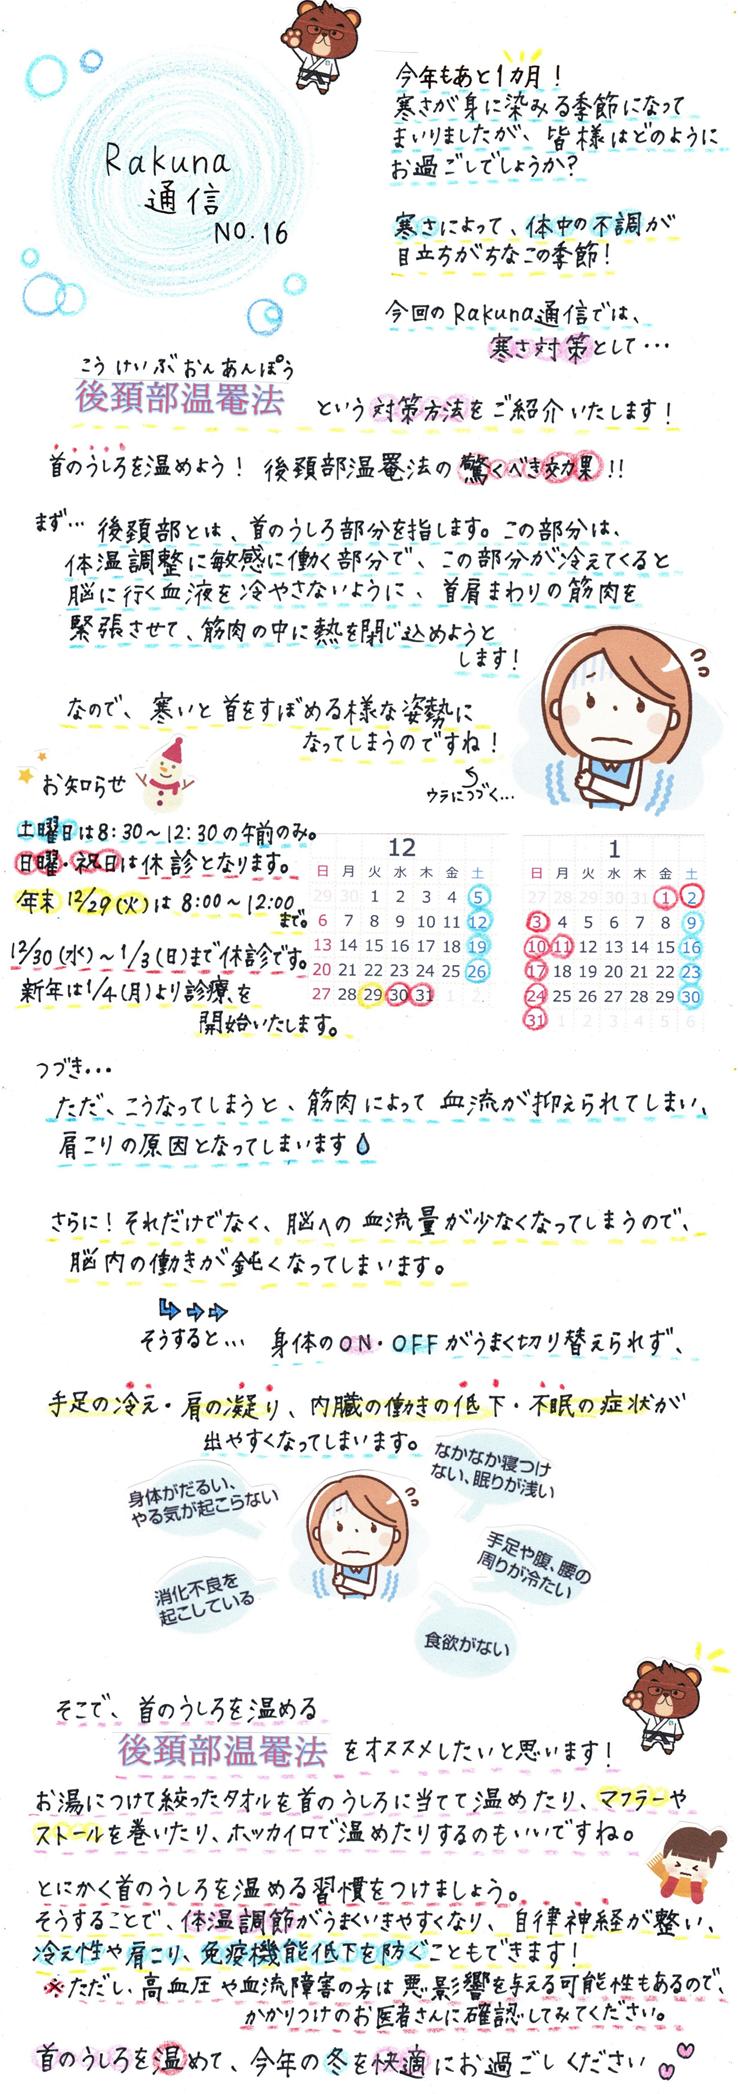 Rakuna~通信16